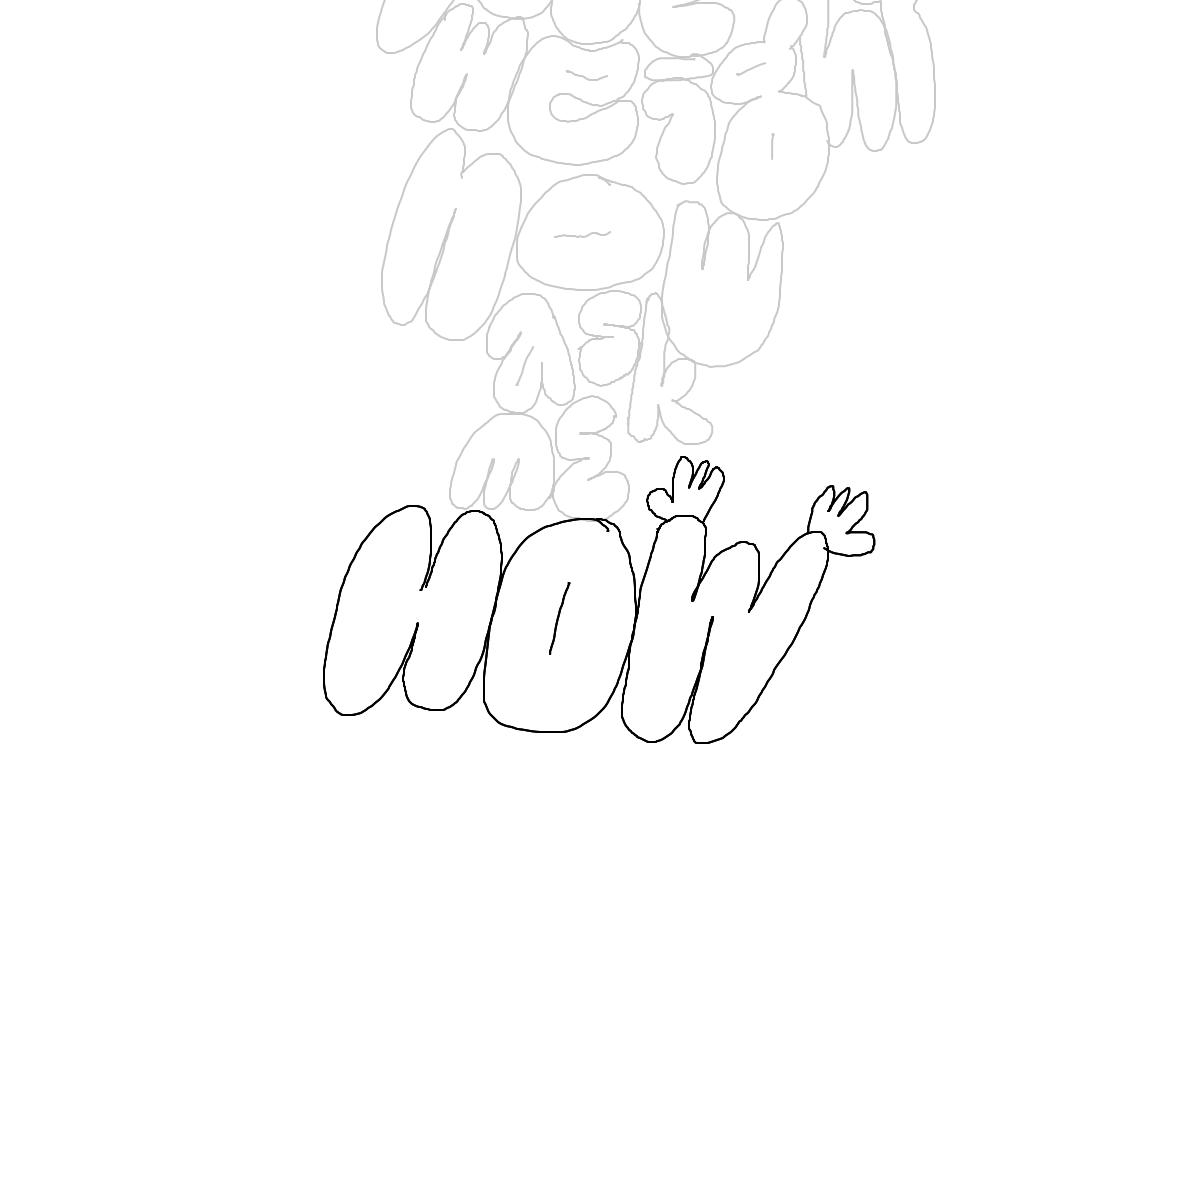 BAAAM drawing#24693 lat:60.0397300720214840lng: -123.7480239868164000